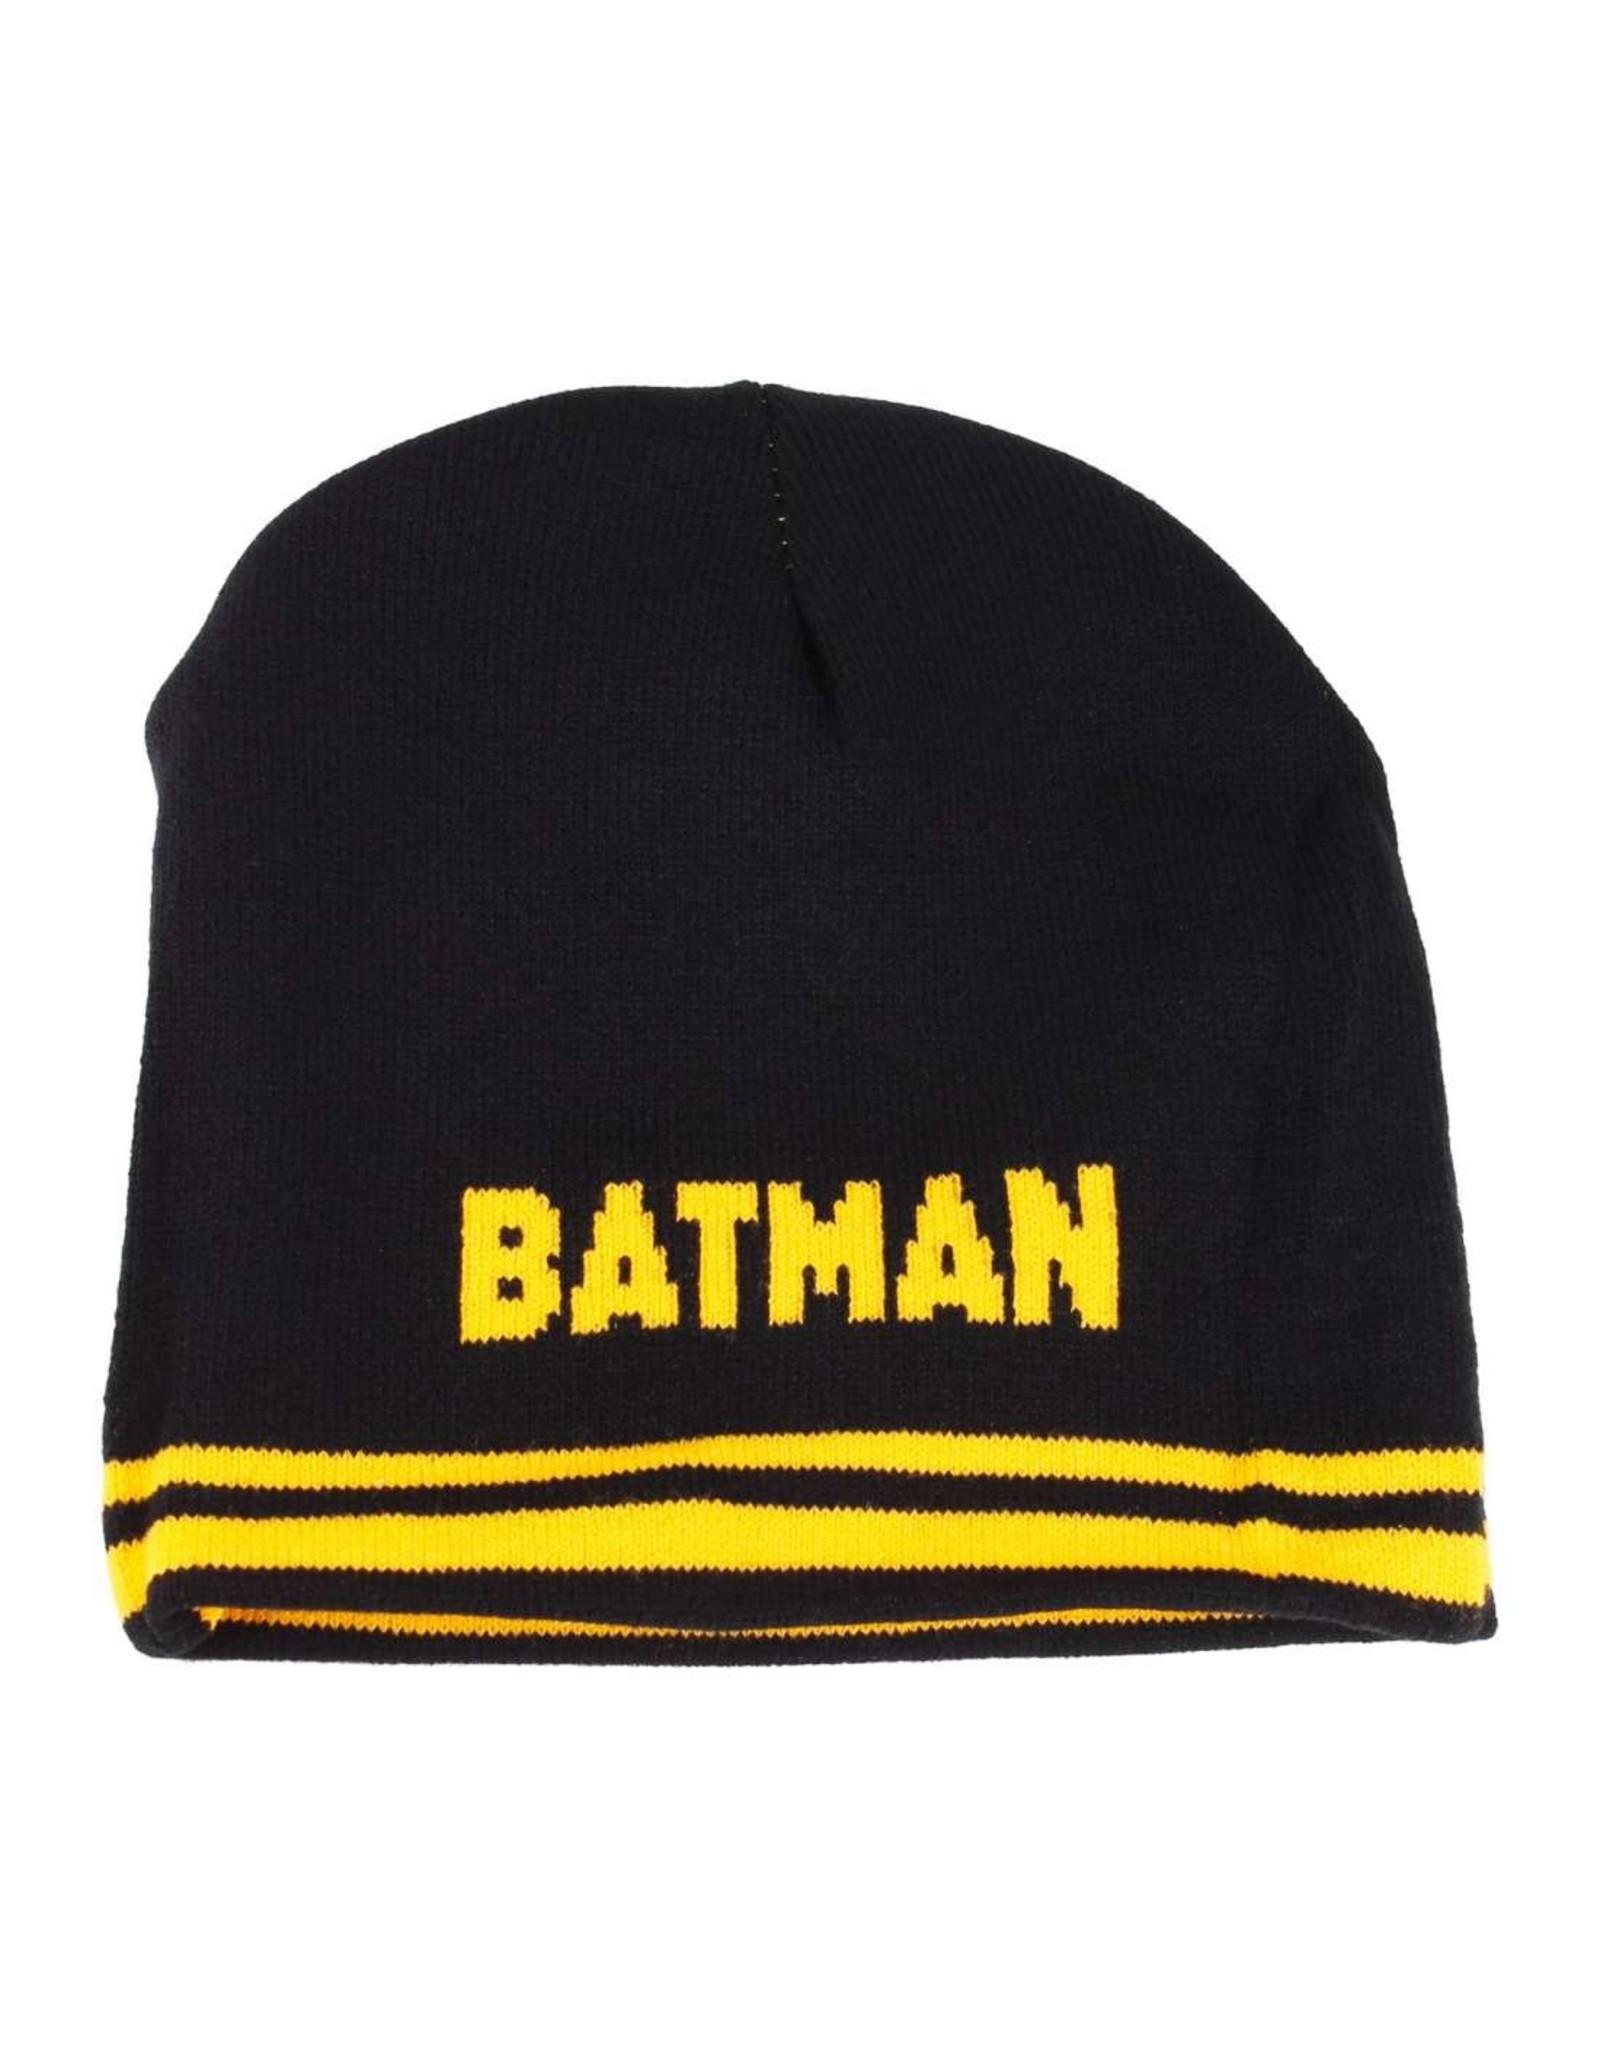 BATMAN Reversible Black/Yellow Beanie - Classic